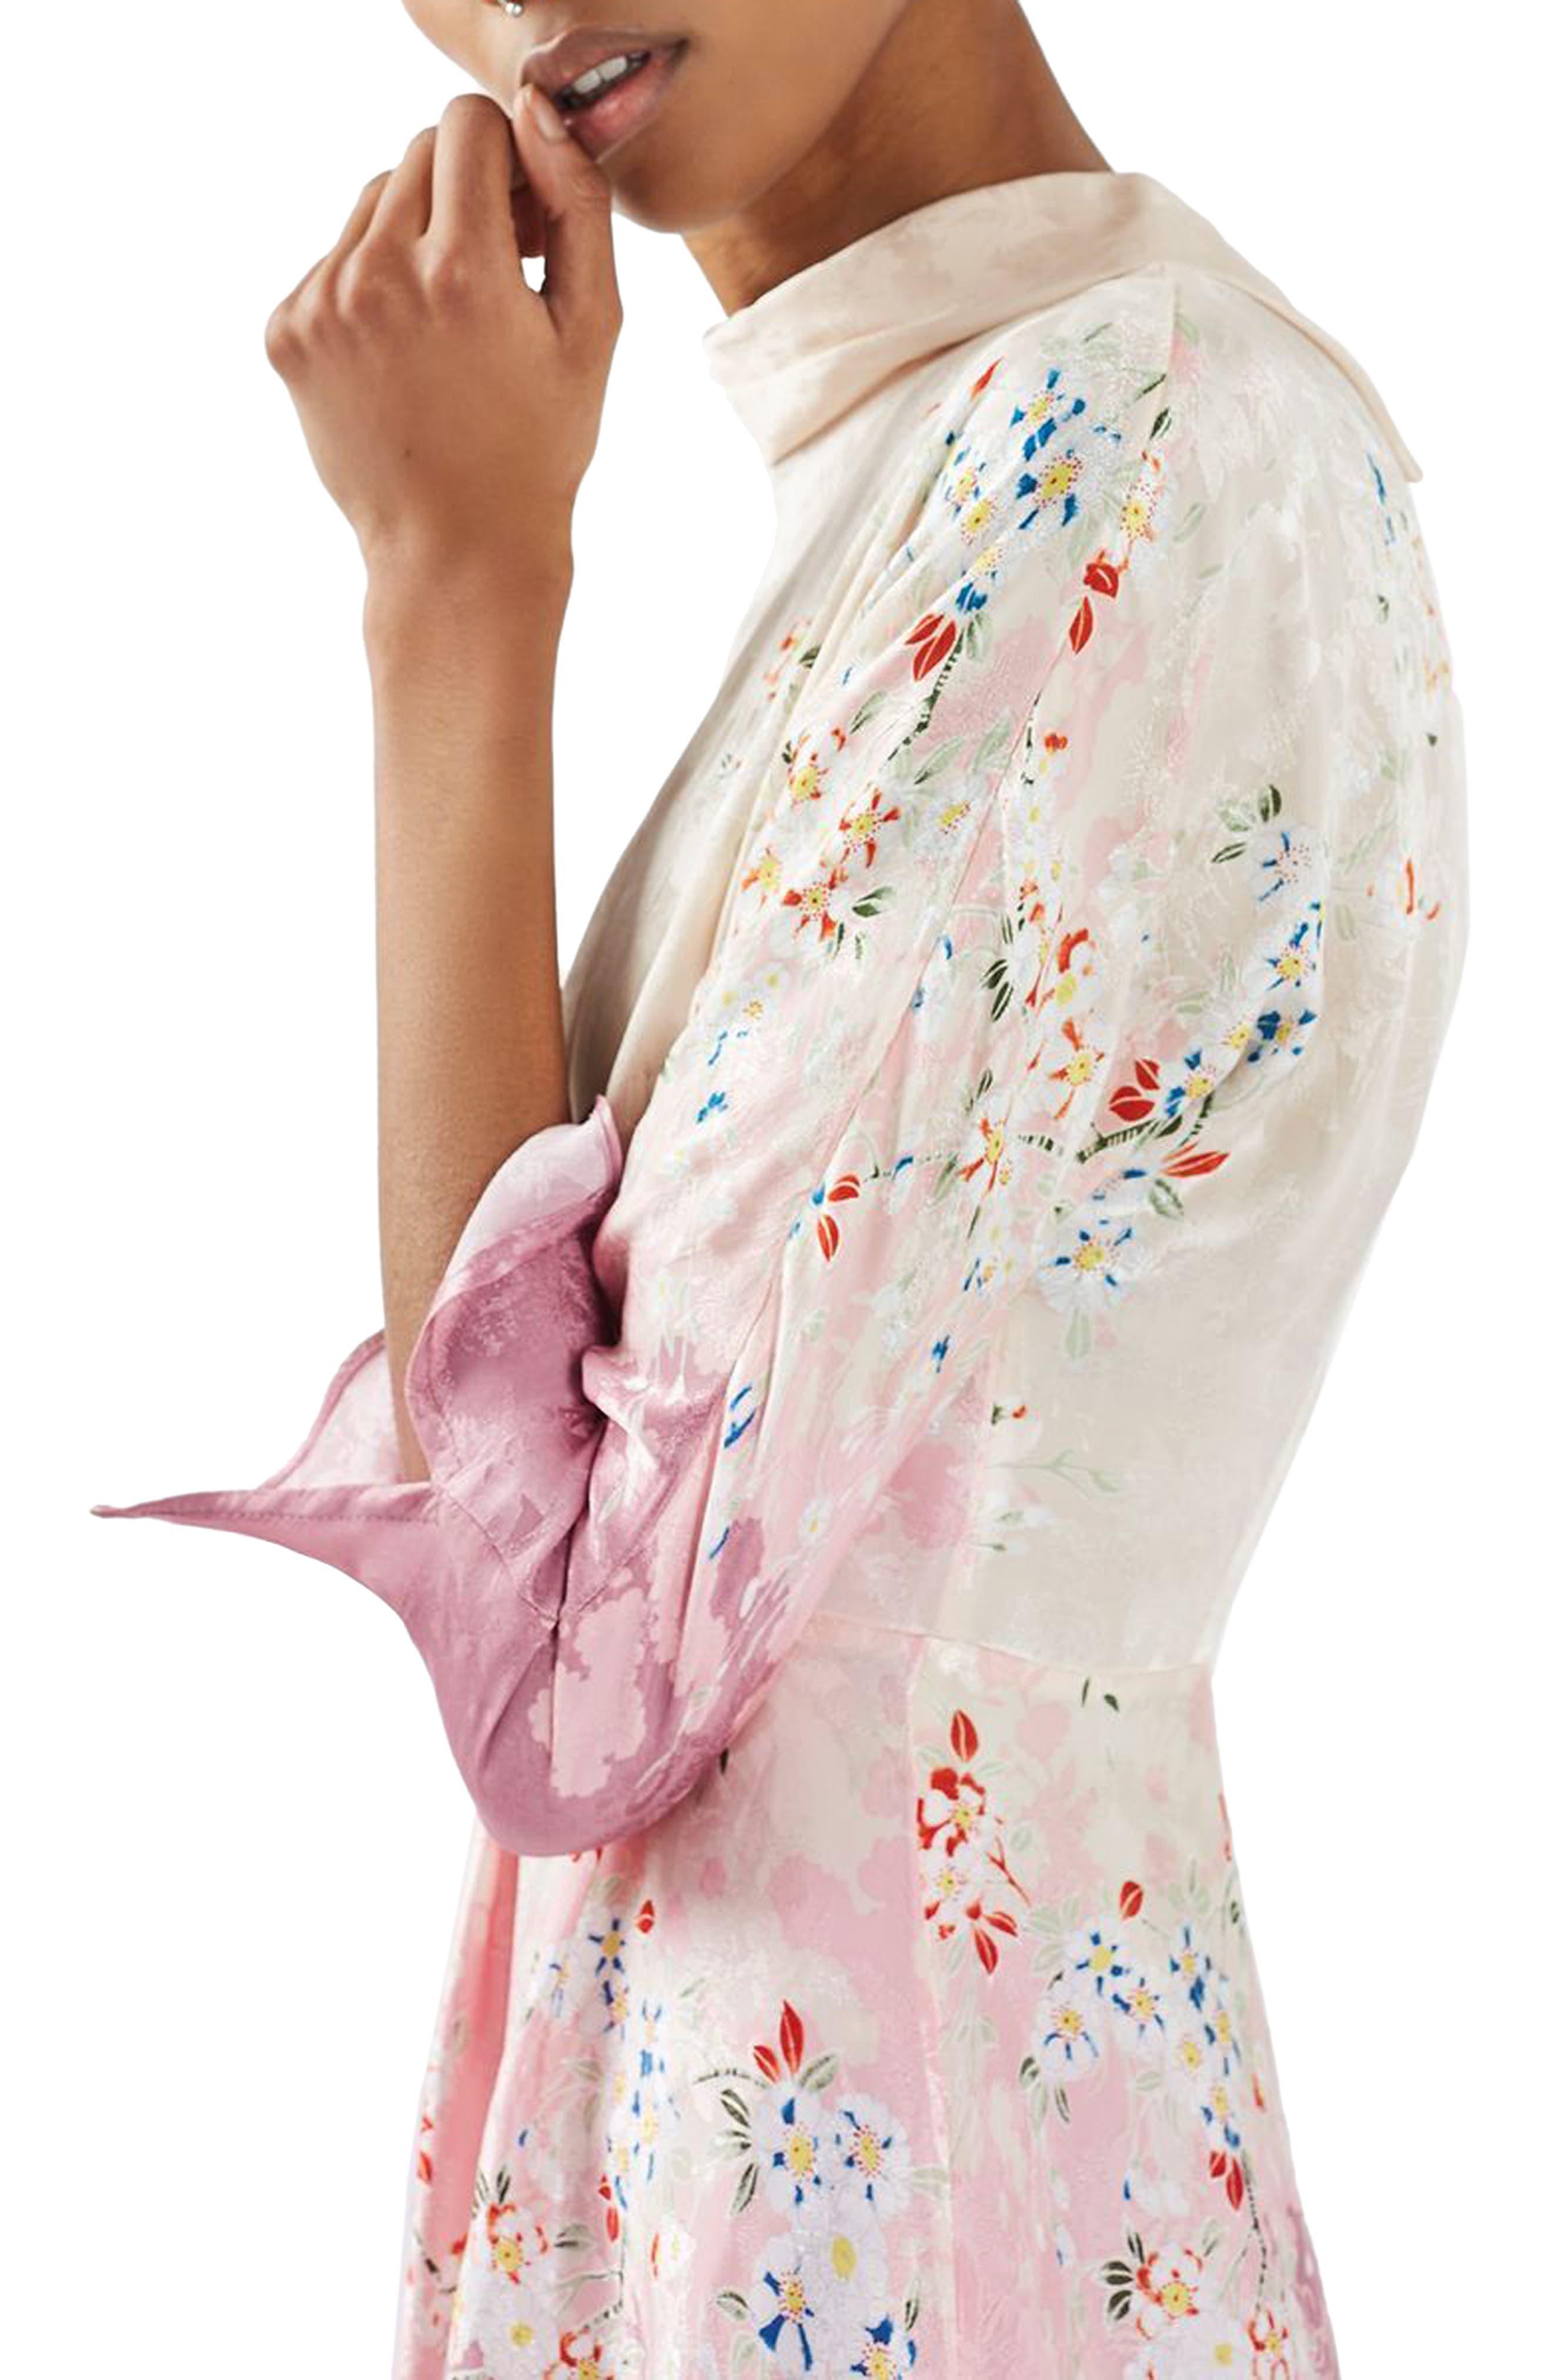 Jacquard Floral Print Dress,                             Alternate thumbnail 3, color,                             680